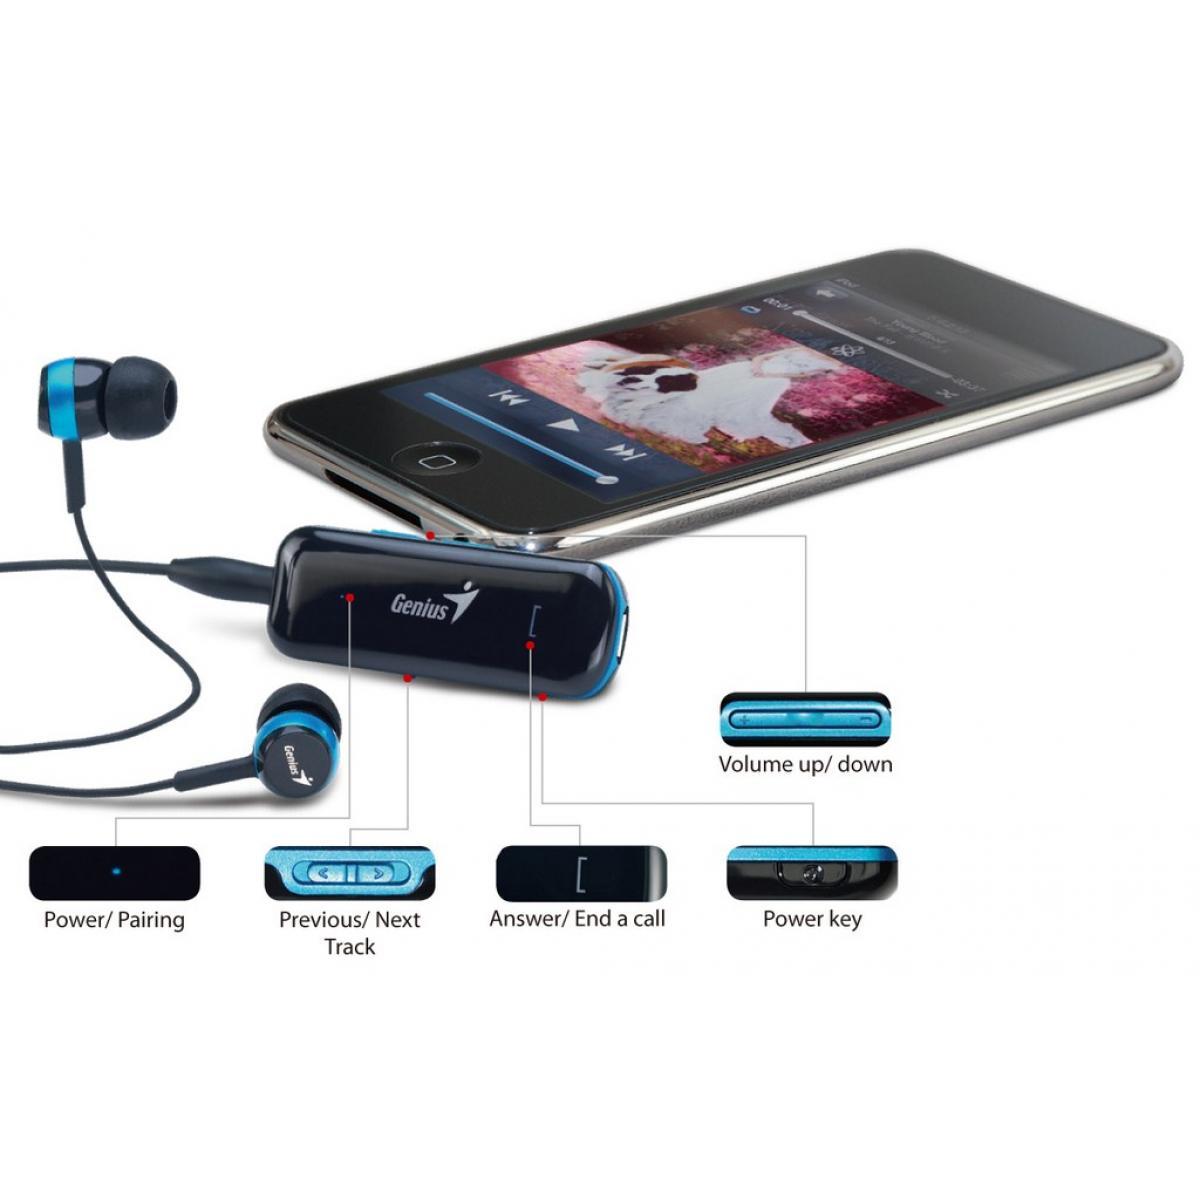 Genius HS-905BT Bluetooth Headset For Music & Call